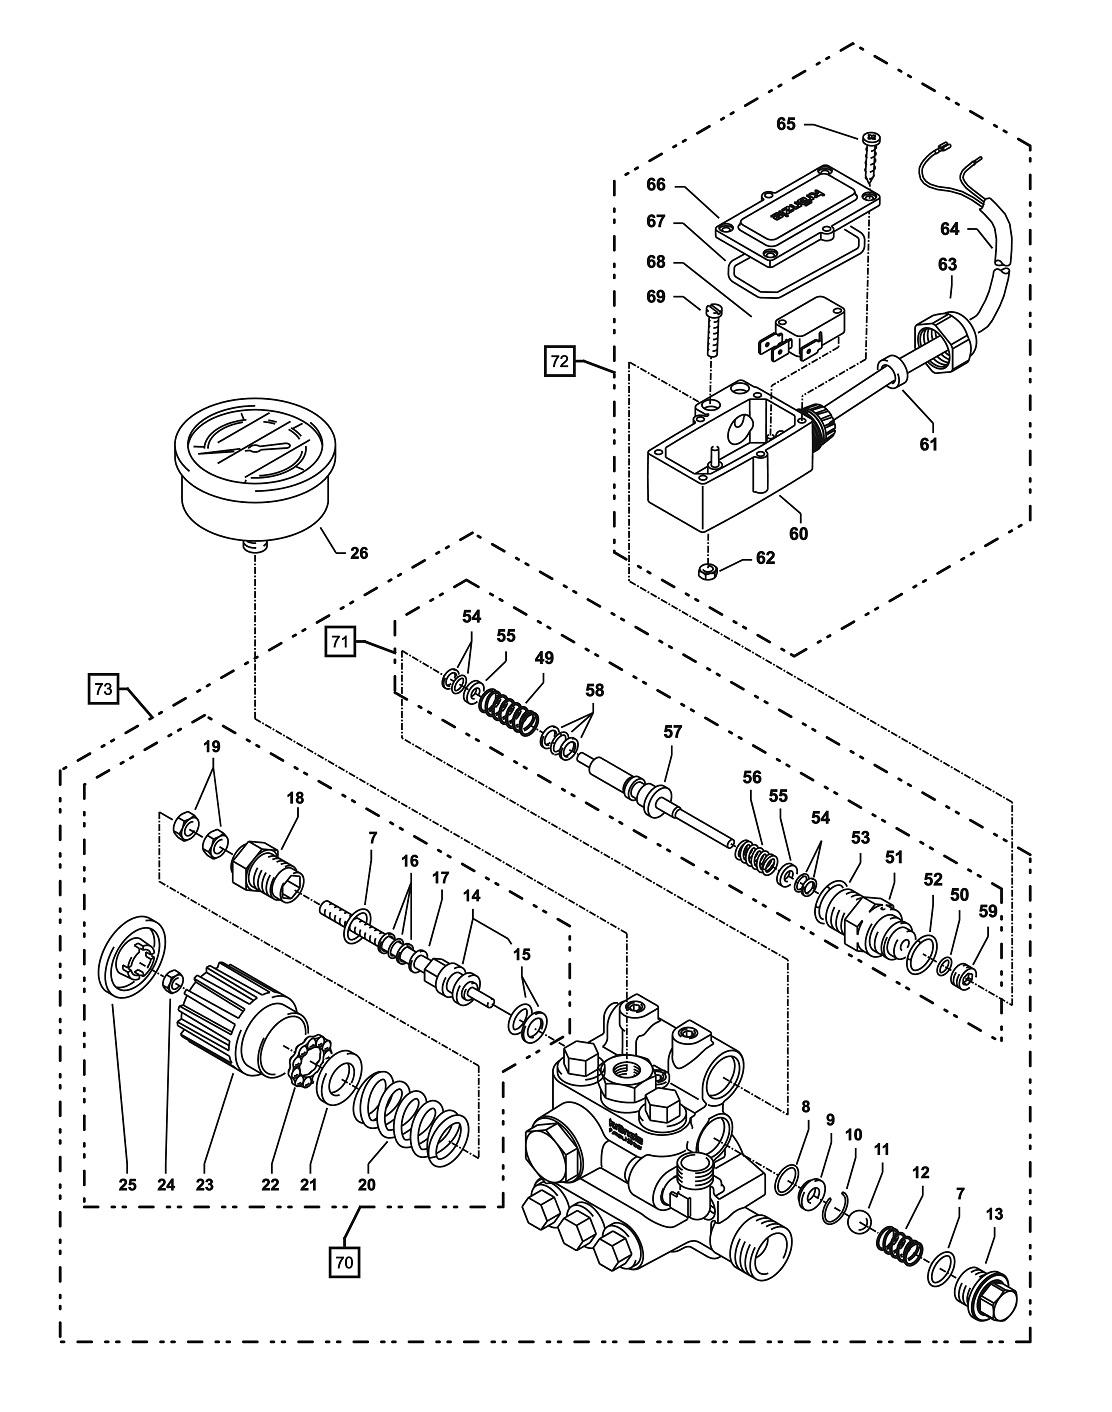 Kranzle Uk Pressure Washers